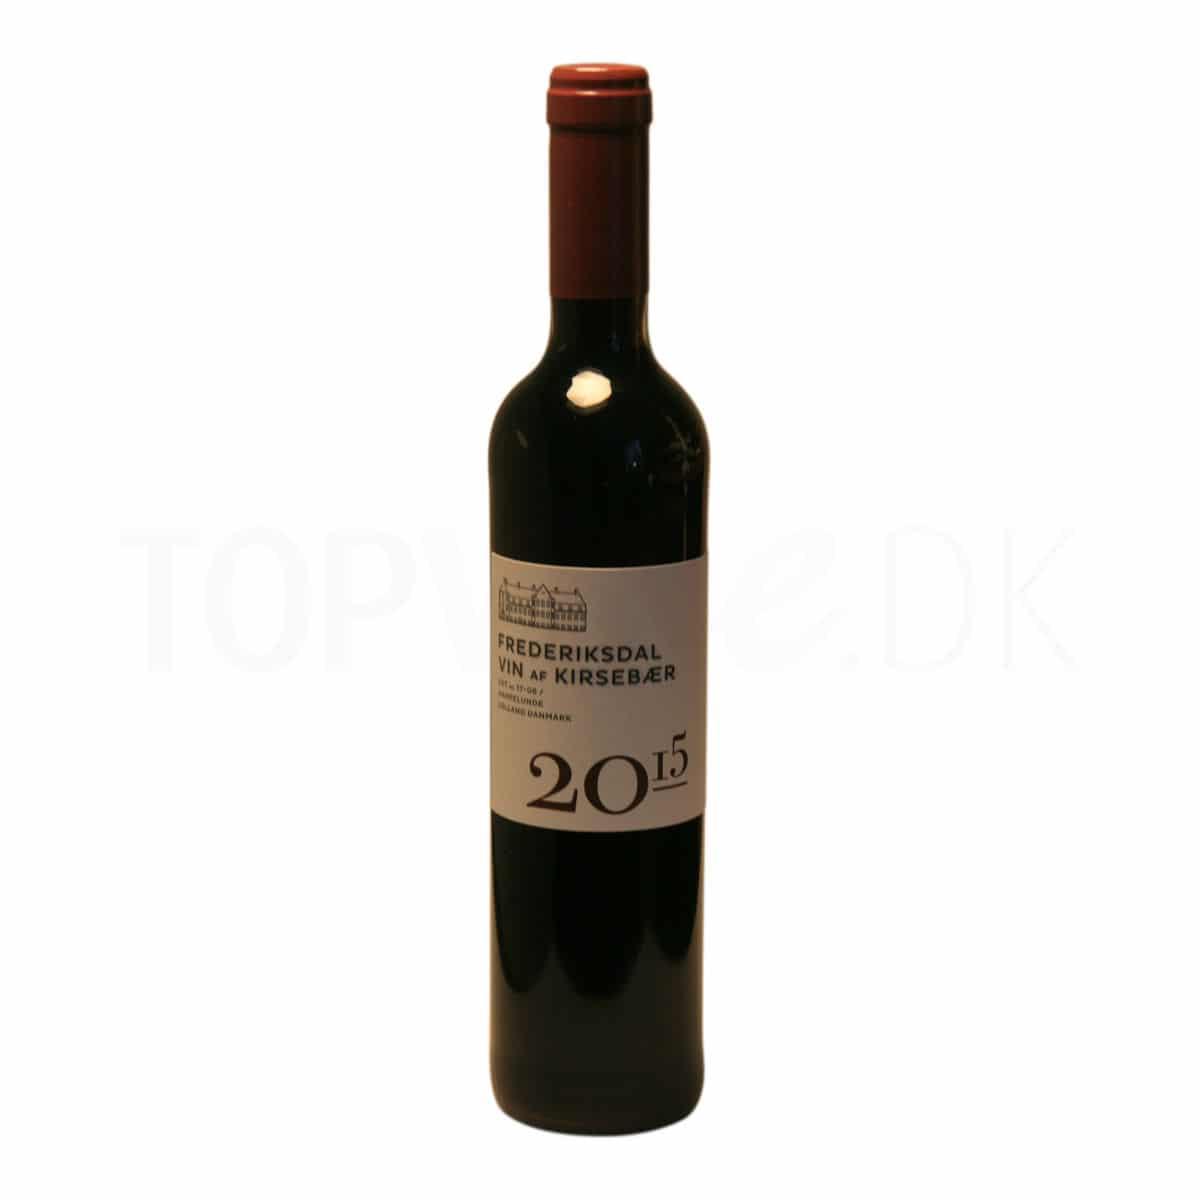 Topvine Frederiksdal kirsebaer vin 2015 500 ml